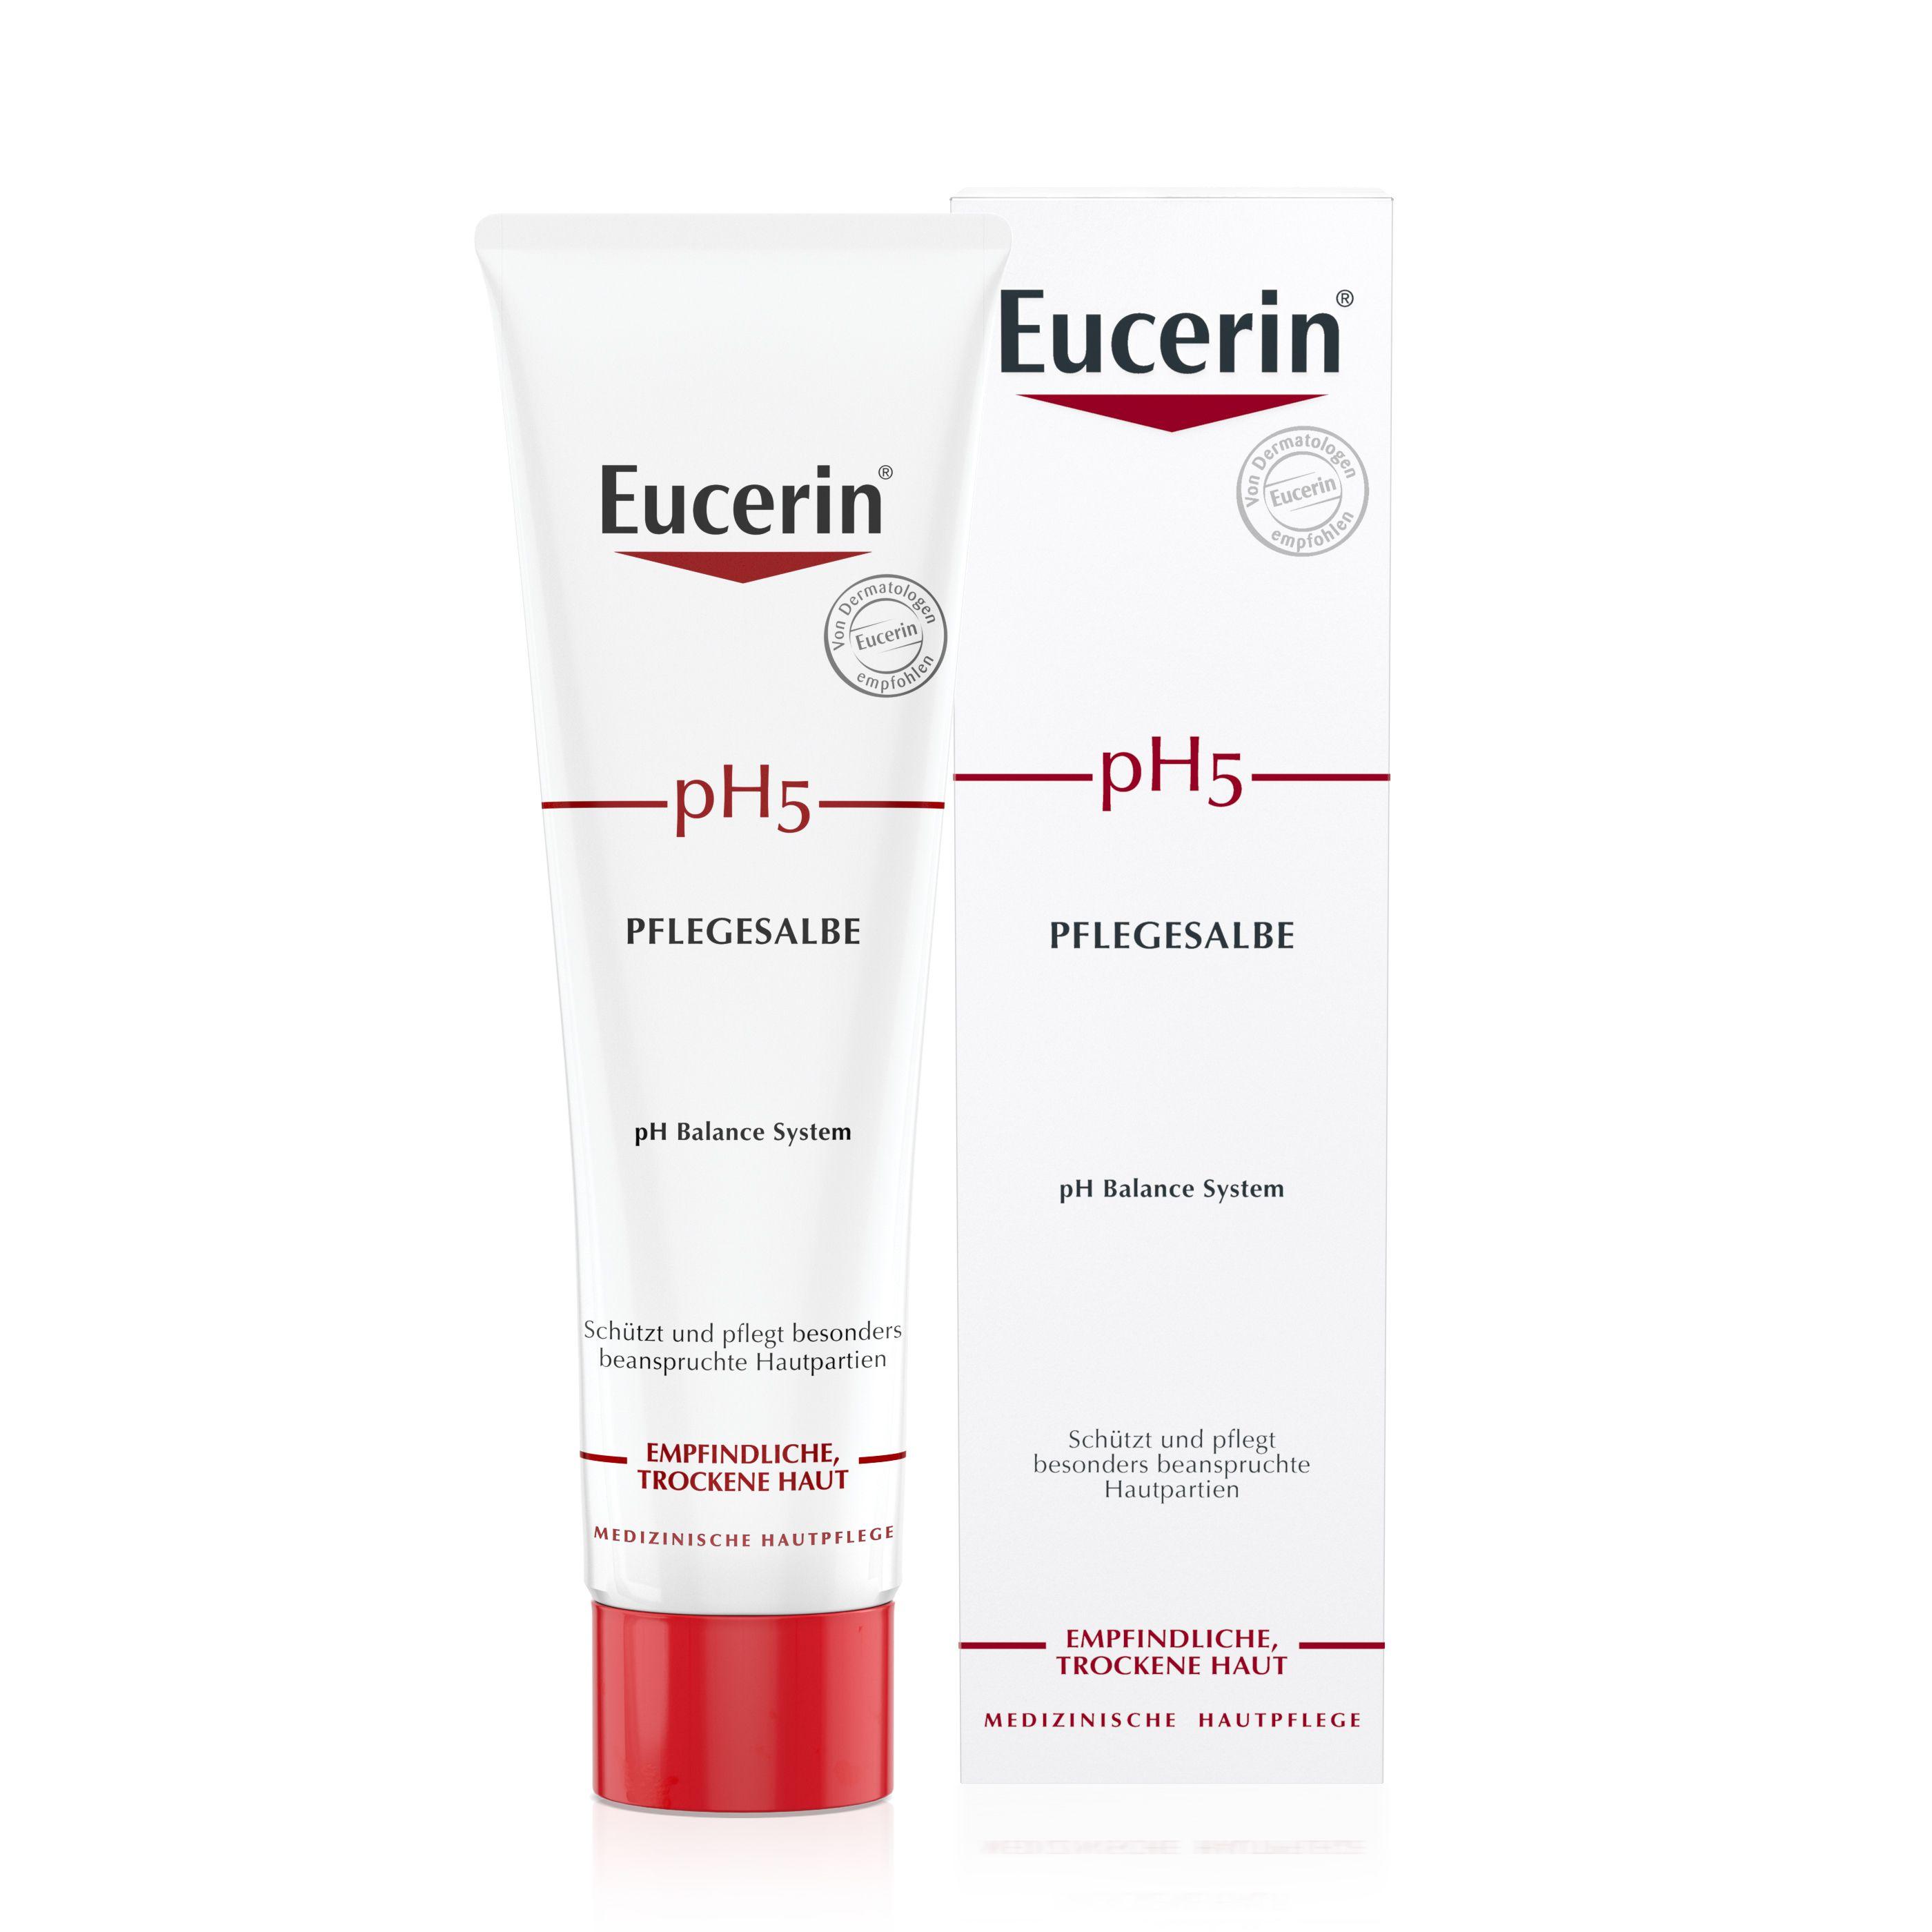 eucerin ph5 skin protection lotion